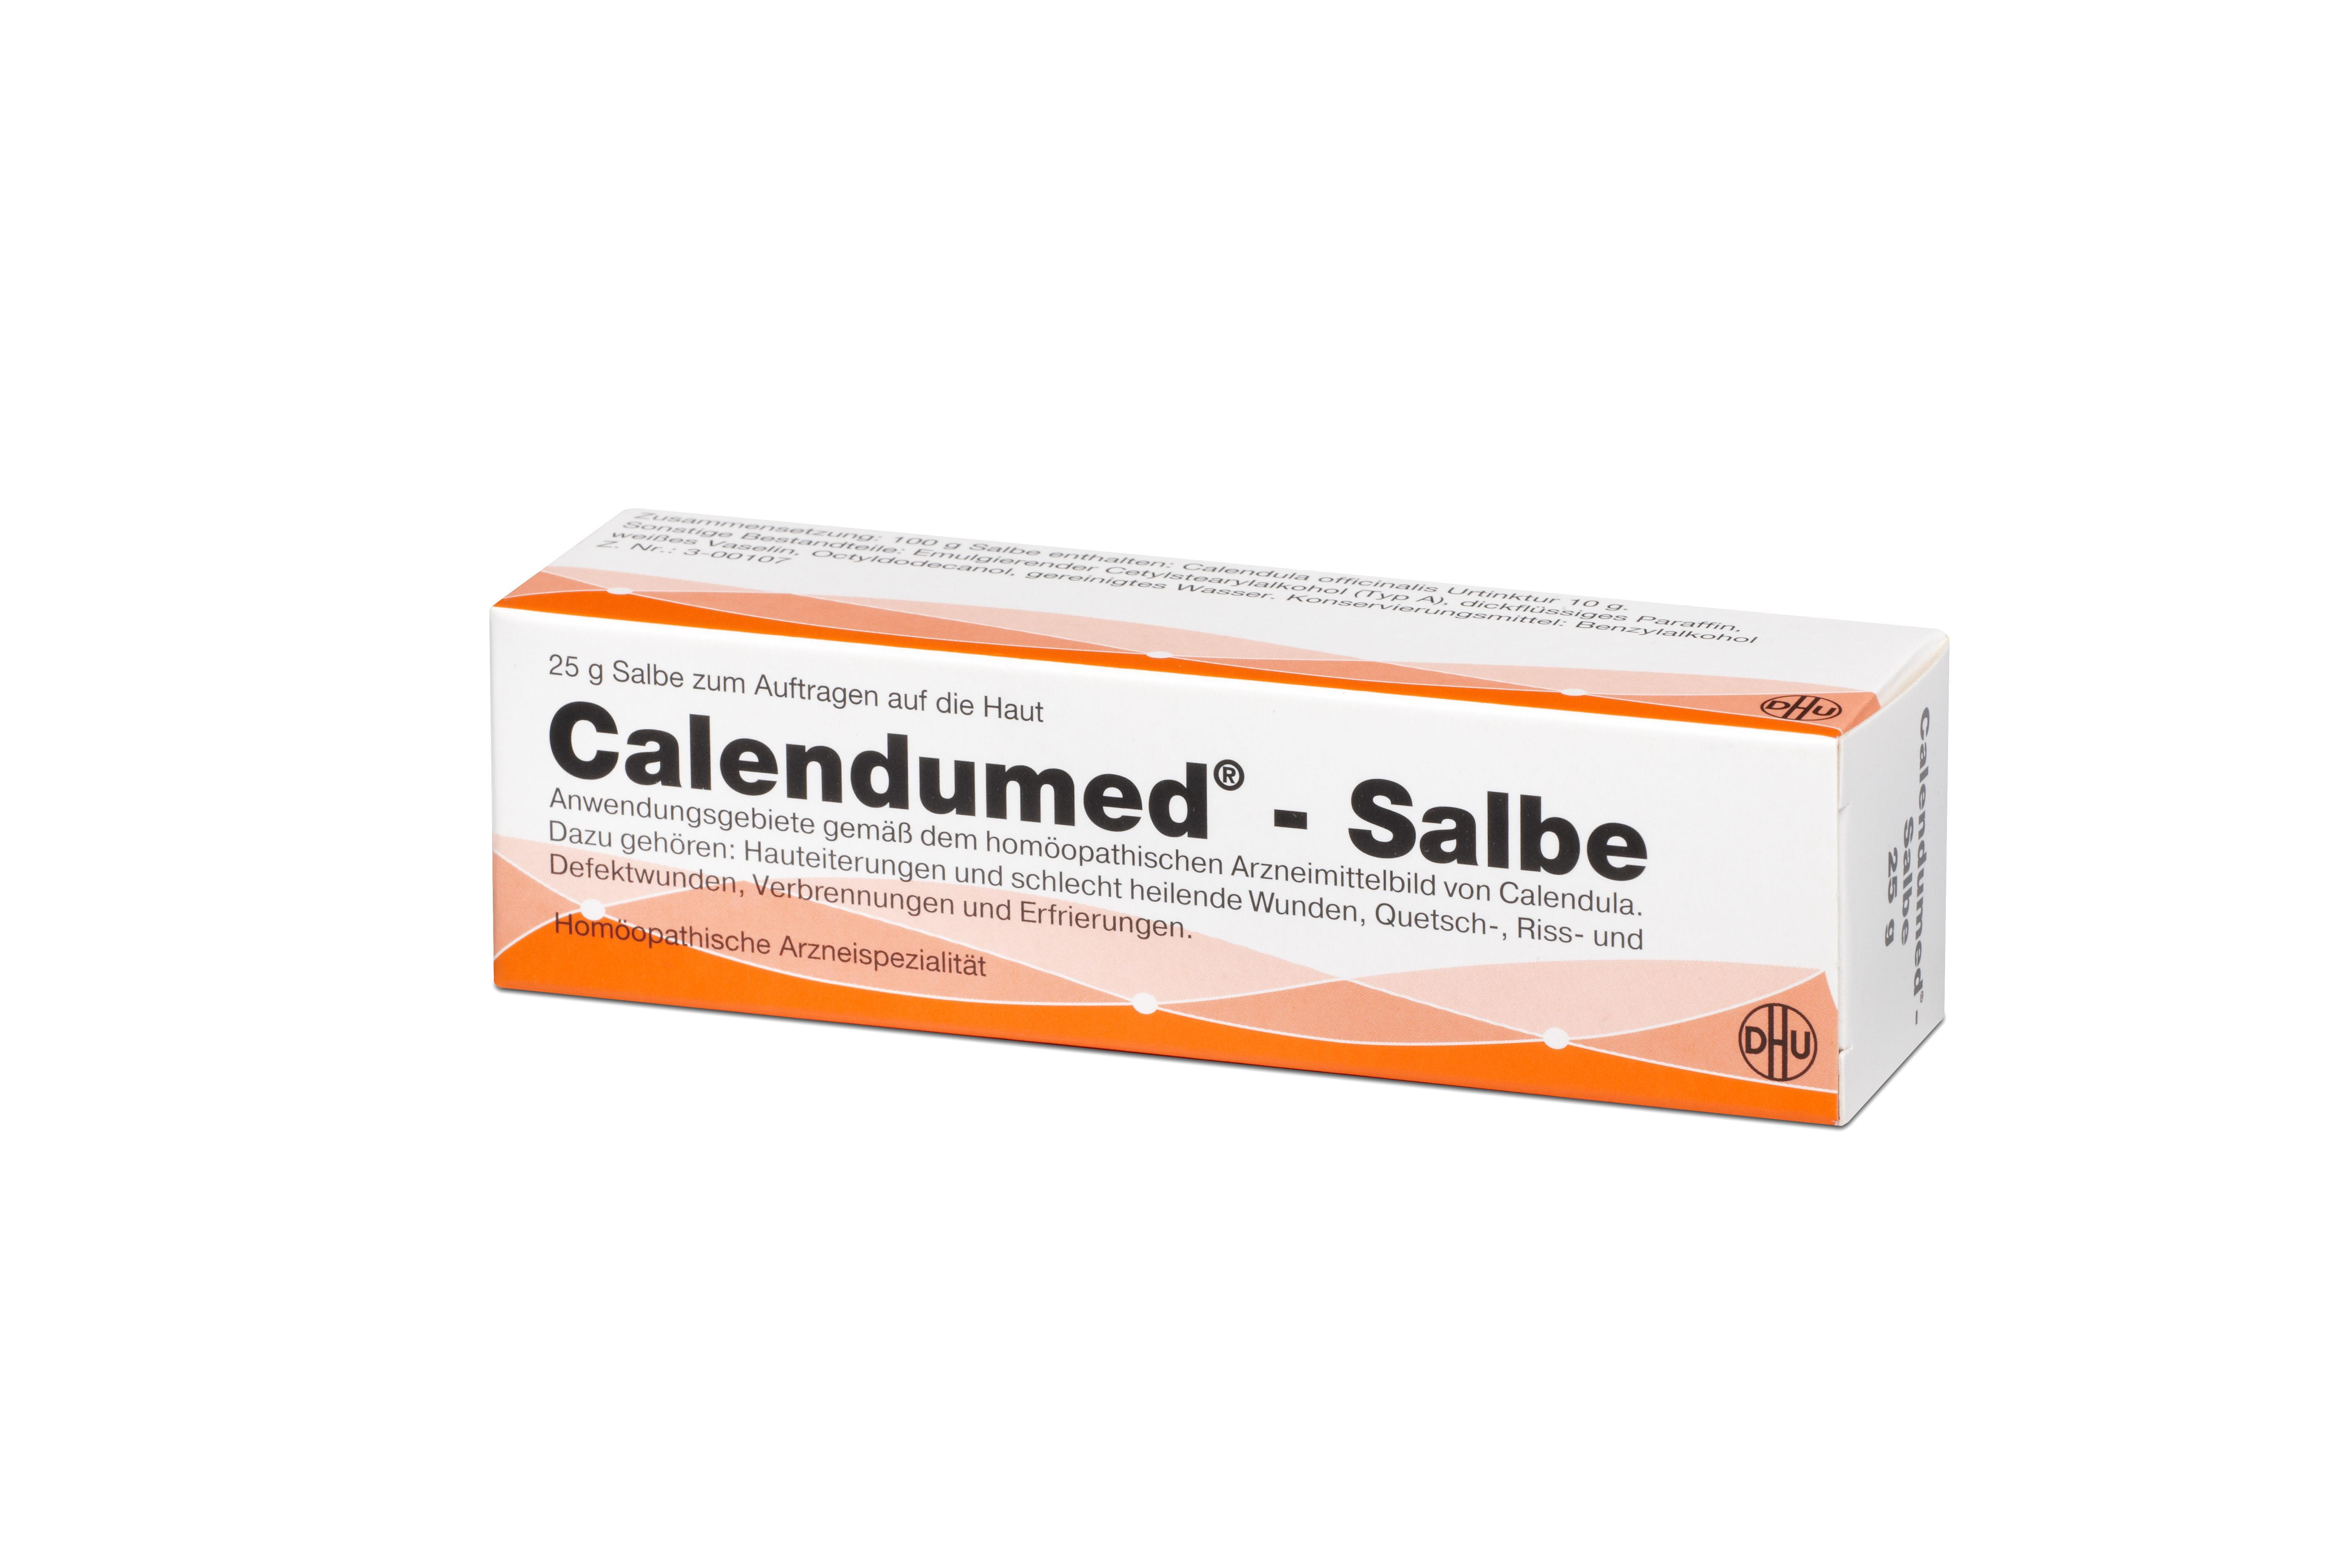 Calendumed®